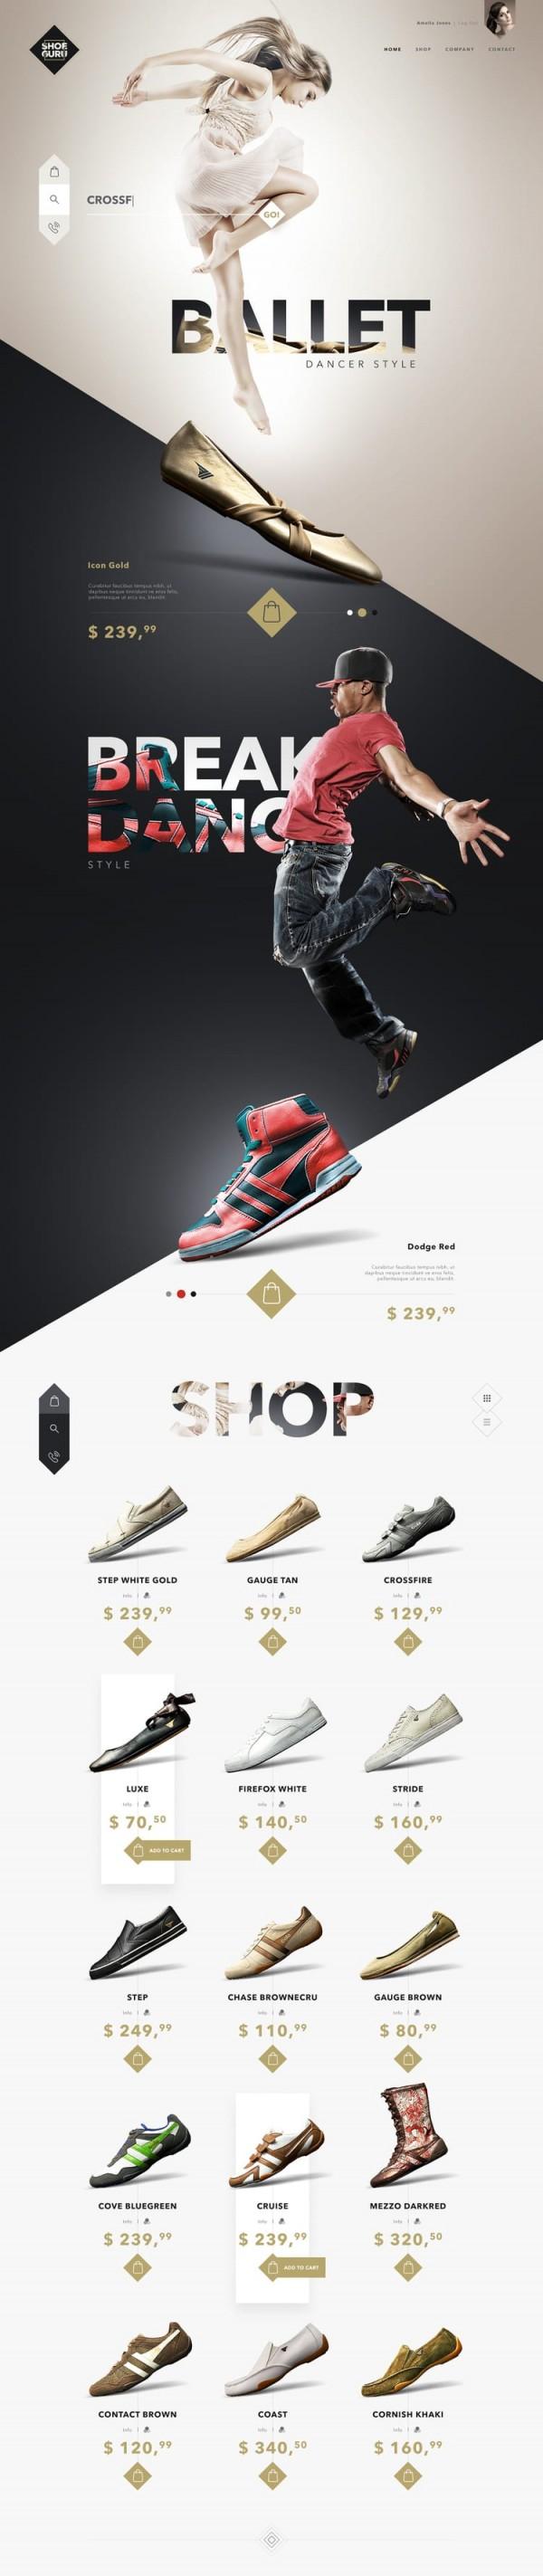 shoe-guru-shop-on-behance-14642631098gn4k-770x3653